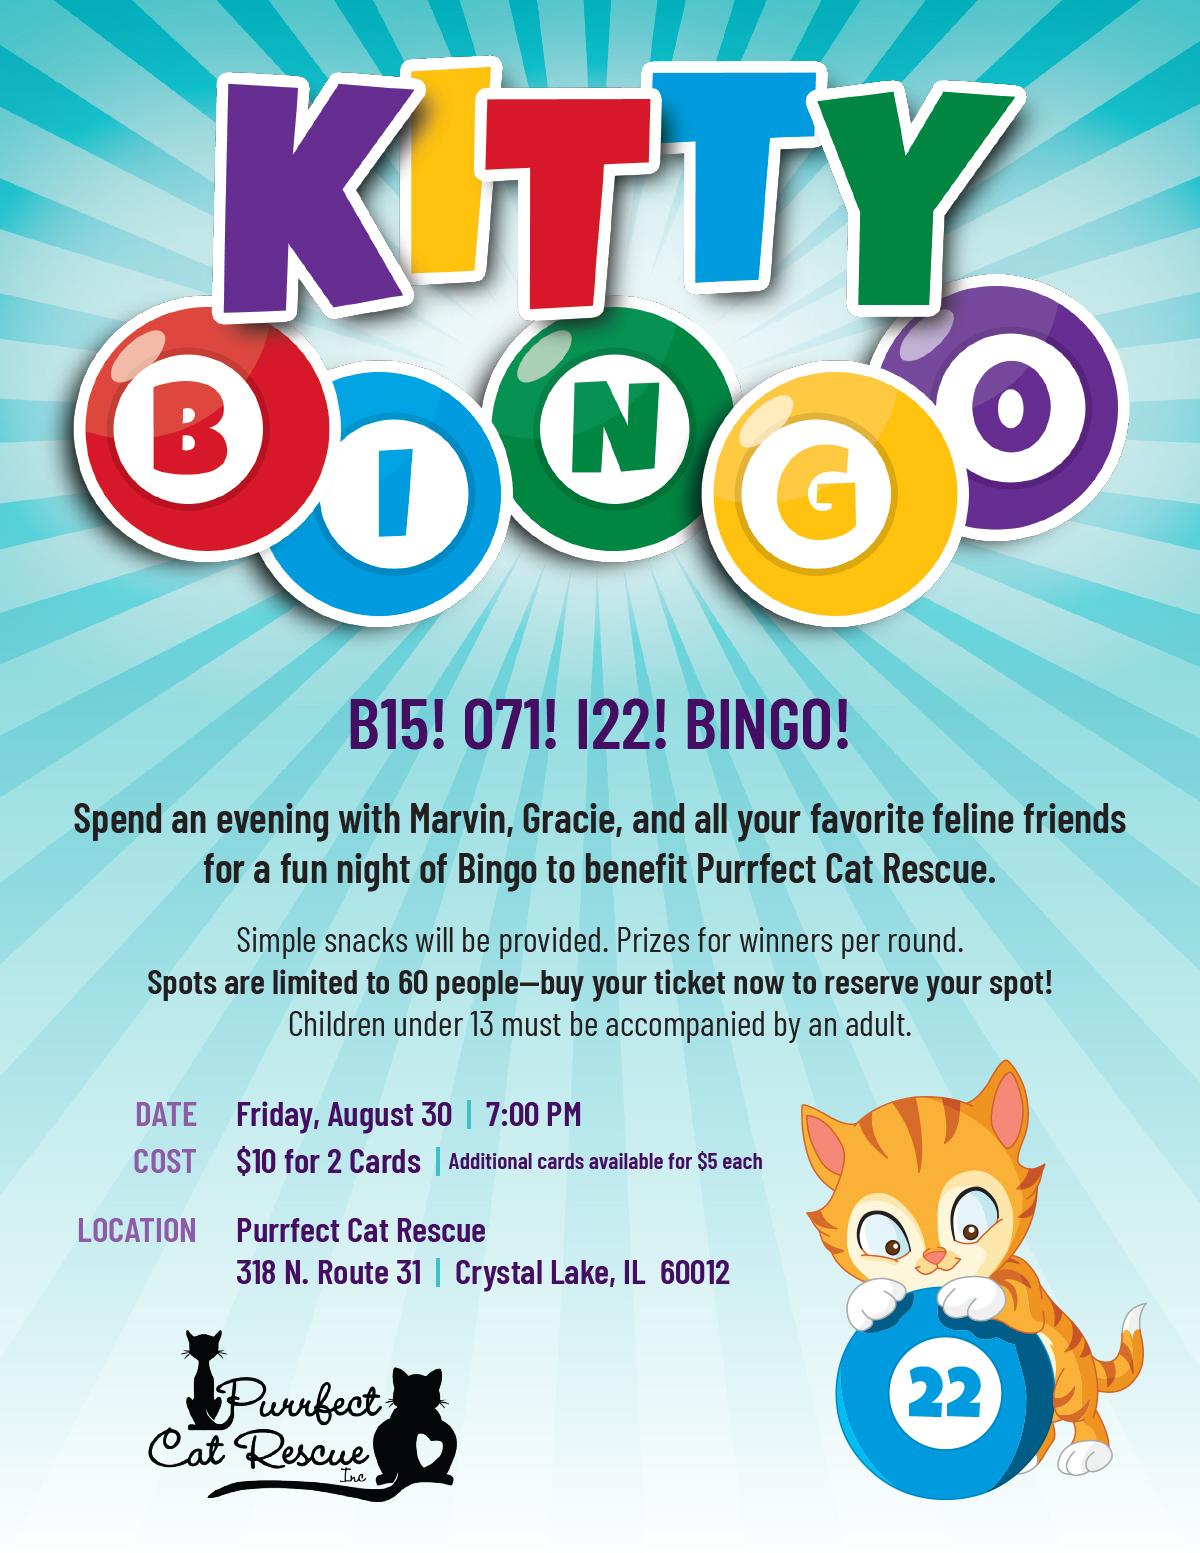 kitty_bingo_flyer_083019_1200x1553.jpg